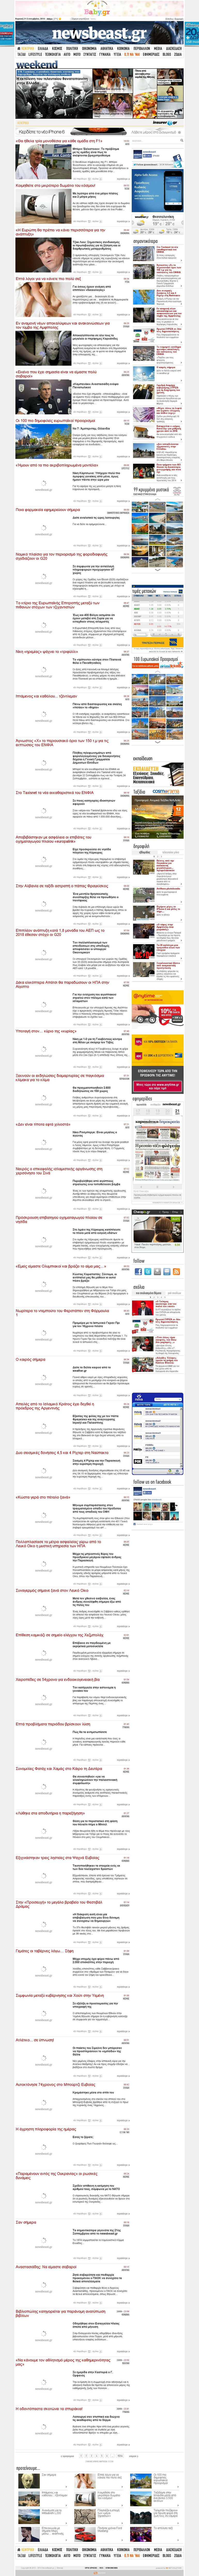 News Beast at Sunday Sept. 21, 2014, 7:11 a.m. UTC